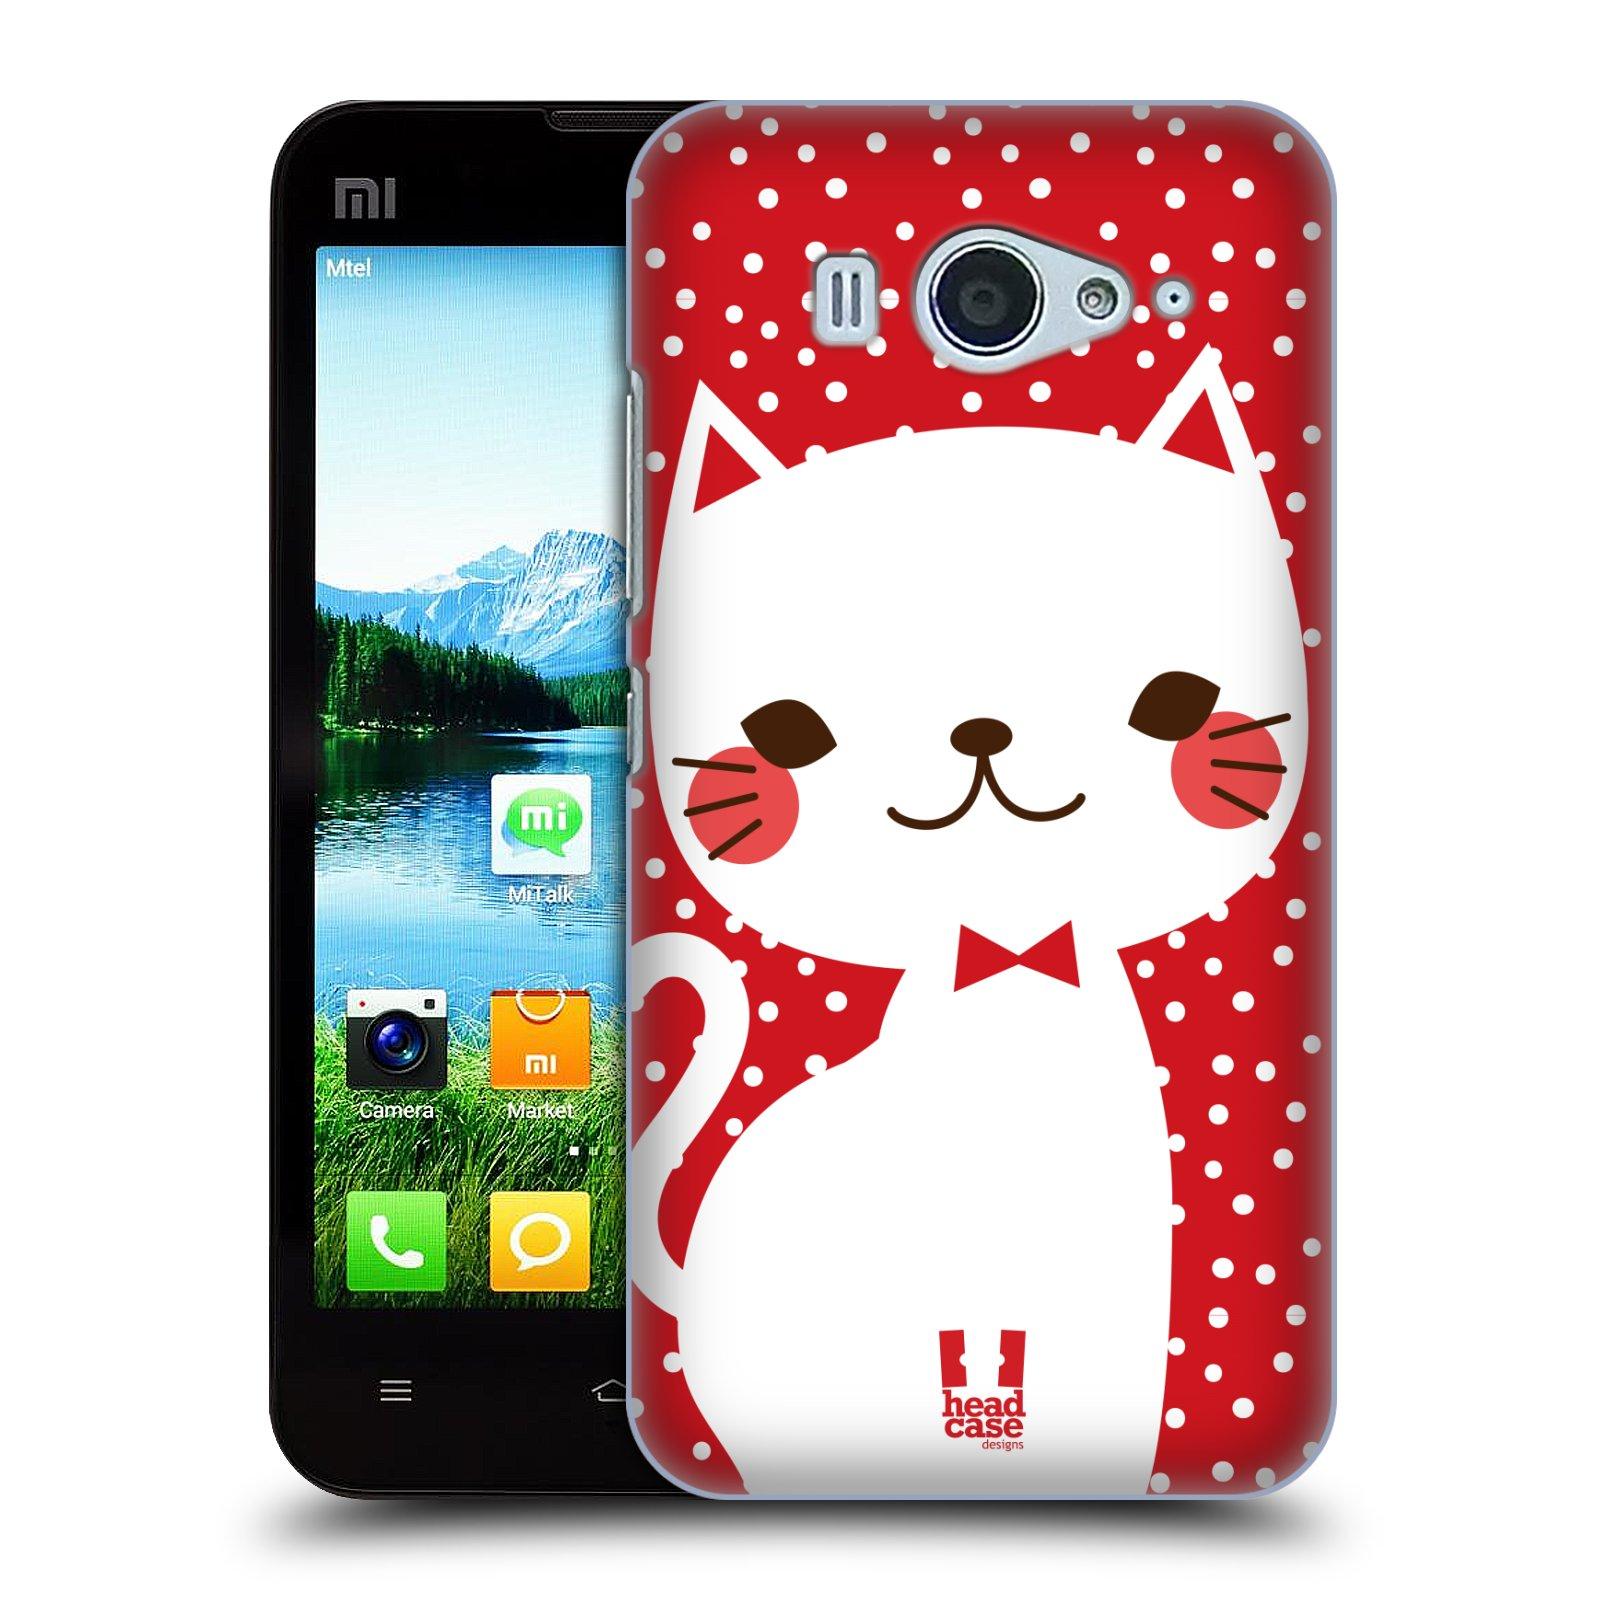 Plastové pouzdro na mobil Xiaomi Mi2S HEAD CASE KOČIČKA BÍLÁ NA ČERVENÉ (Kryt či obal na mobilní telefon Xiaomi Mi2S)